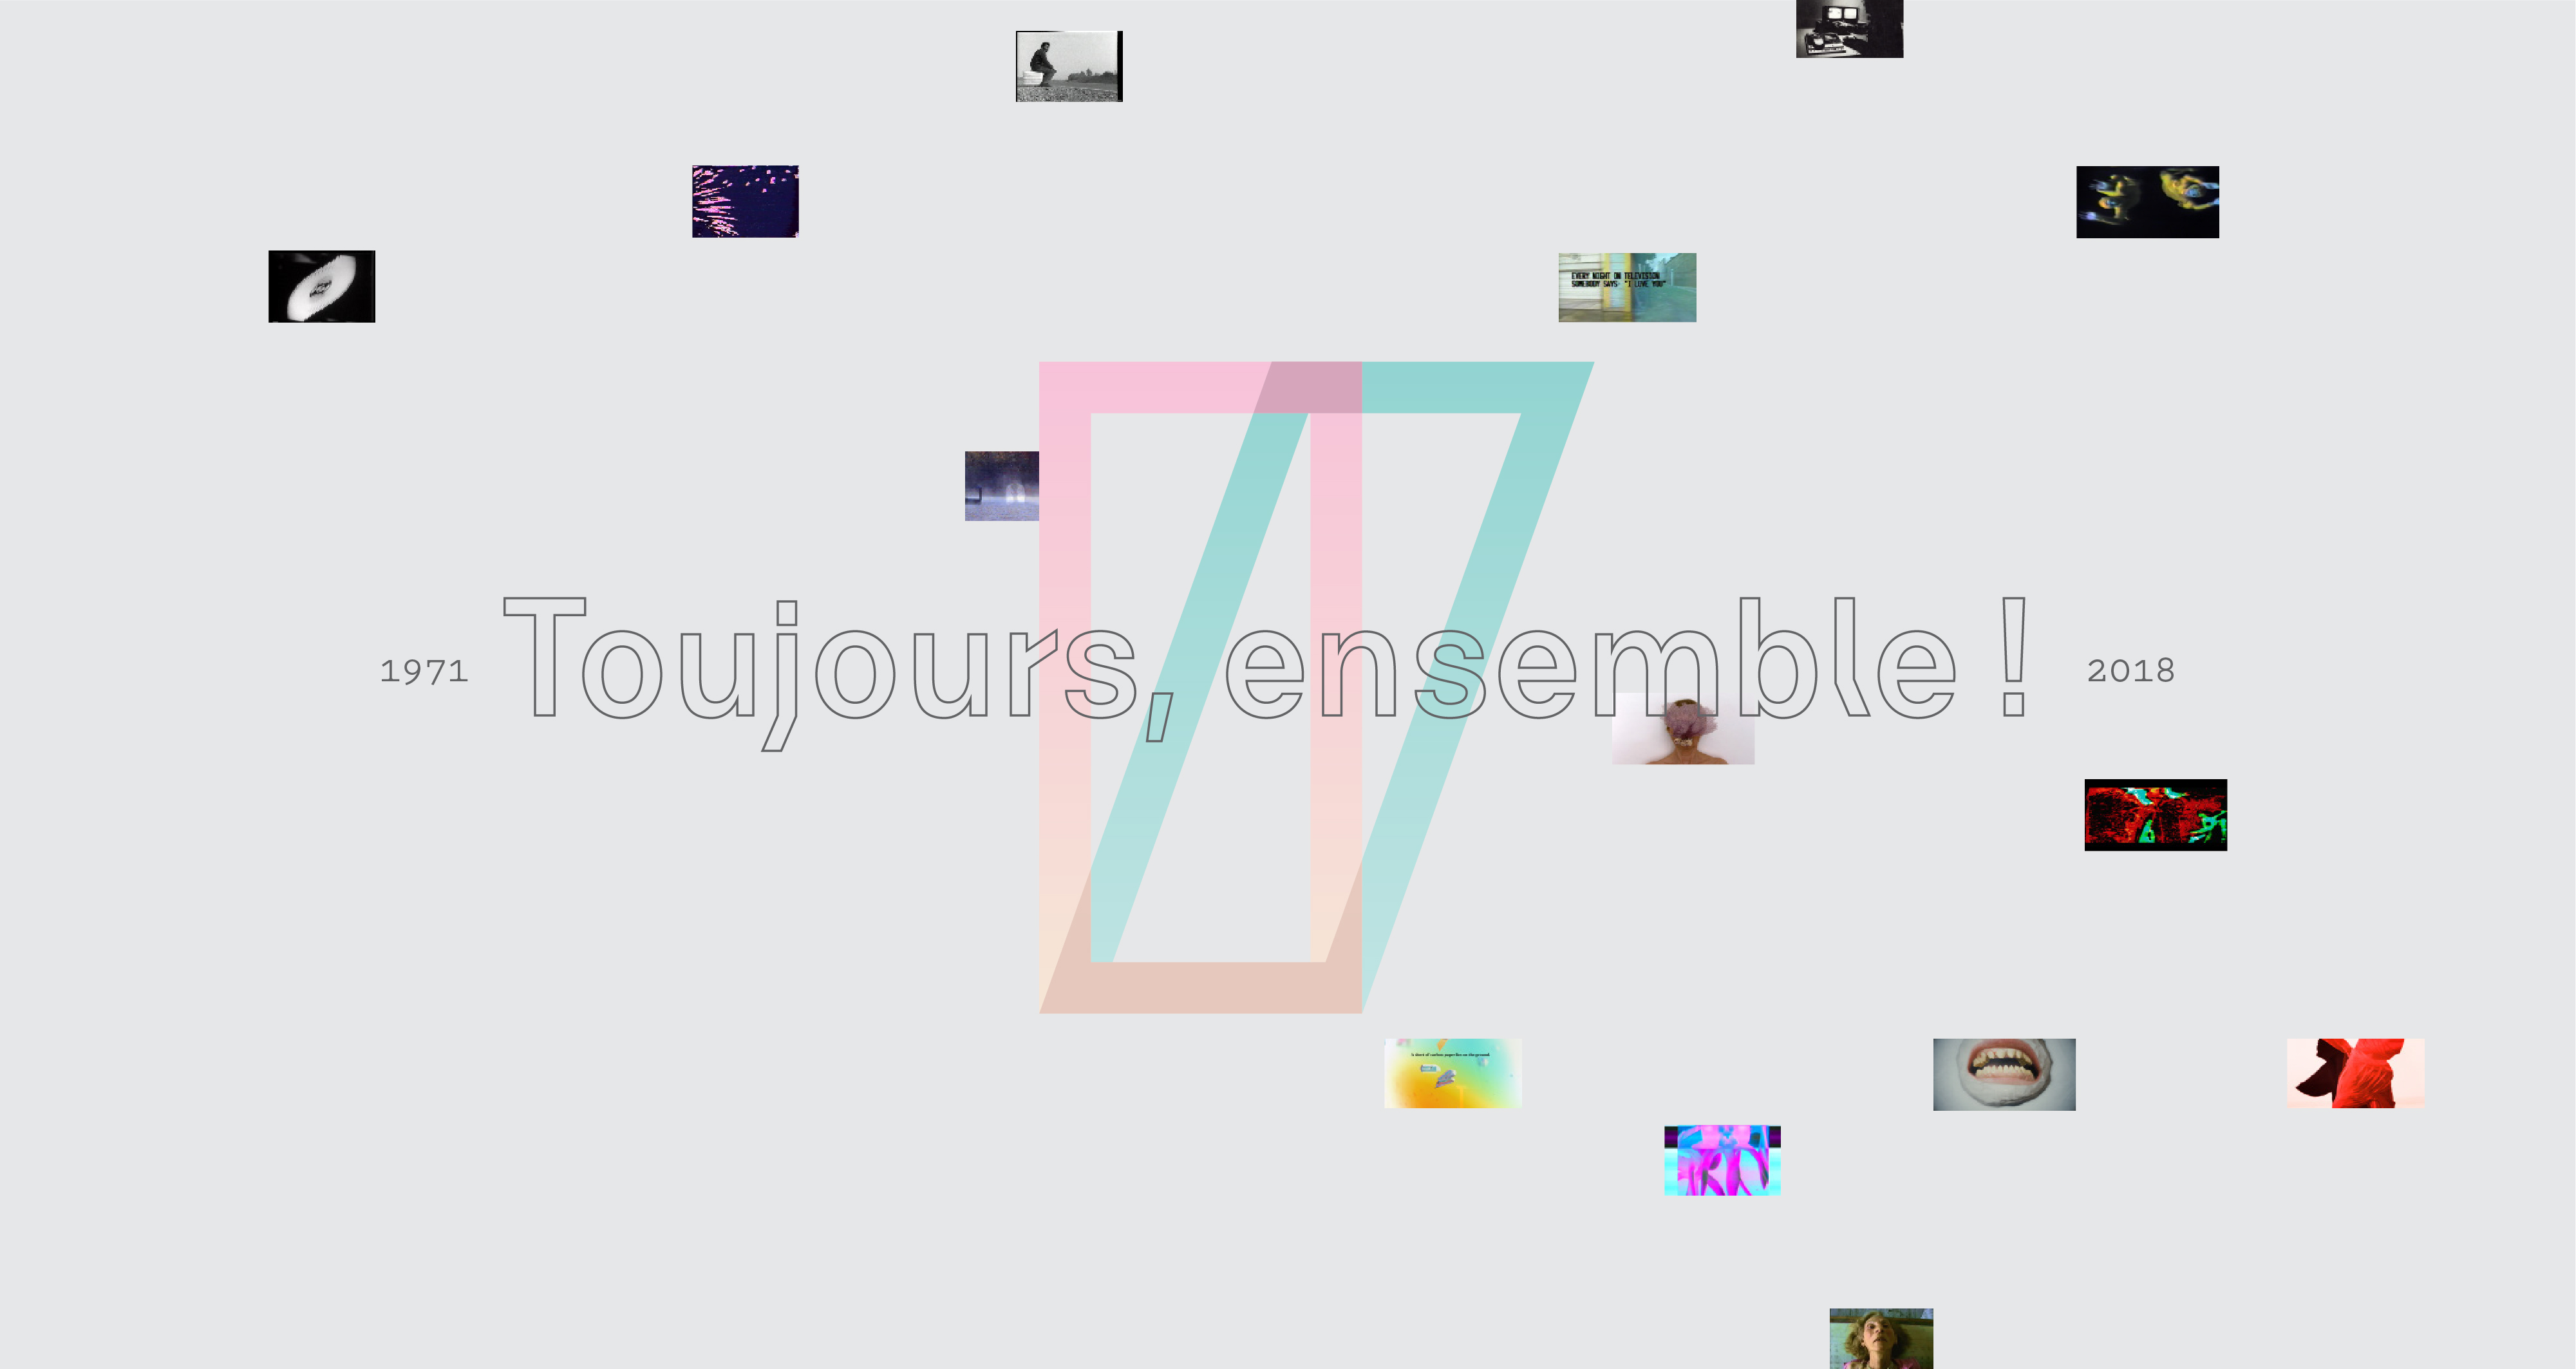 toujours ensemble, logo Vidéographe et mini-photos